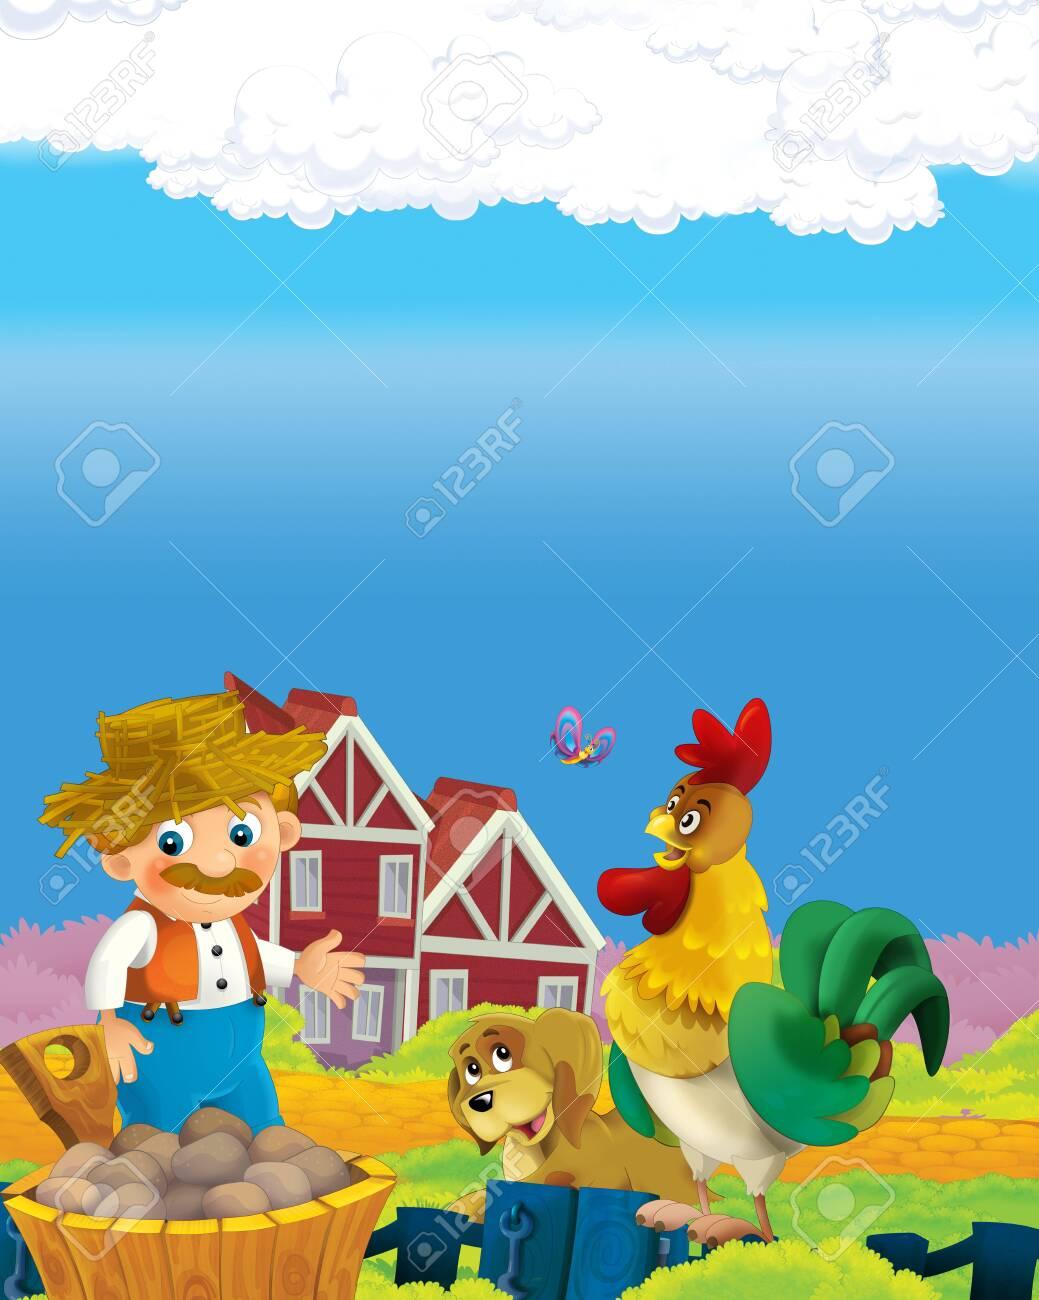 cartoon scene with happy farmer man on the farm ranch illustration for the children - 135191478